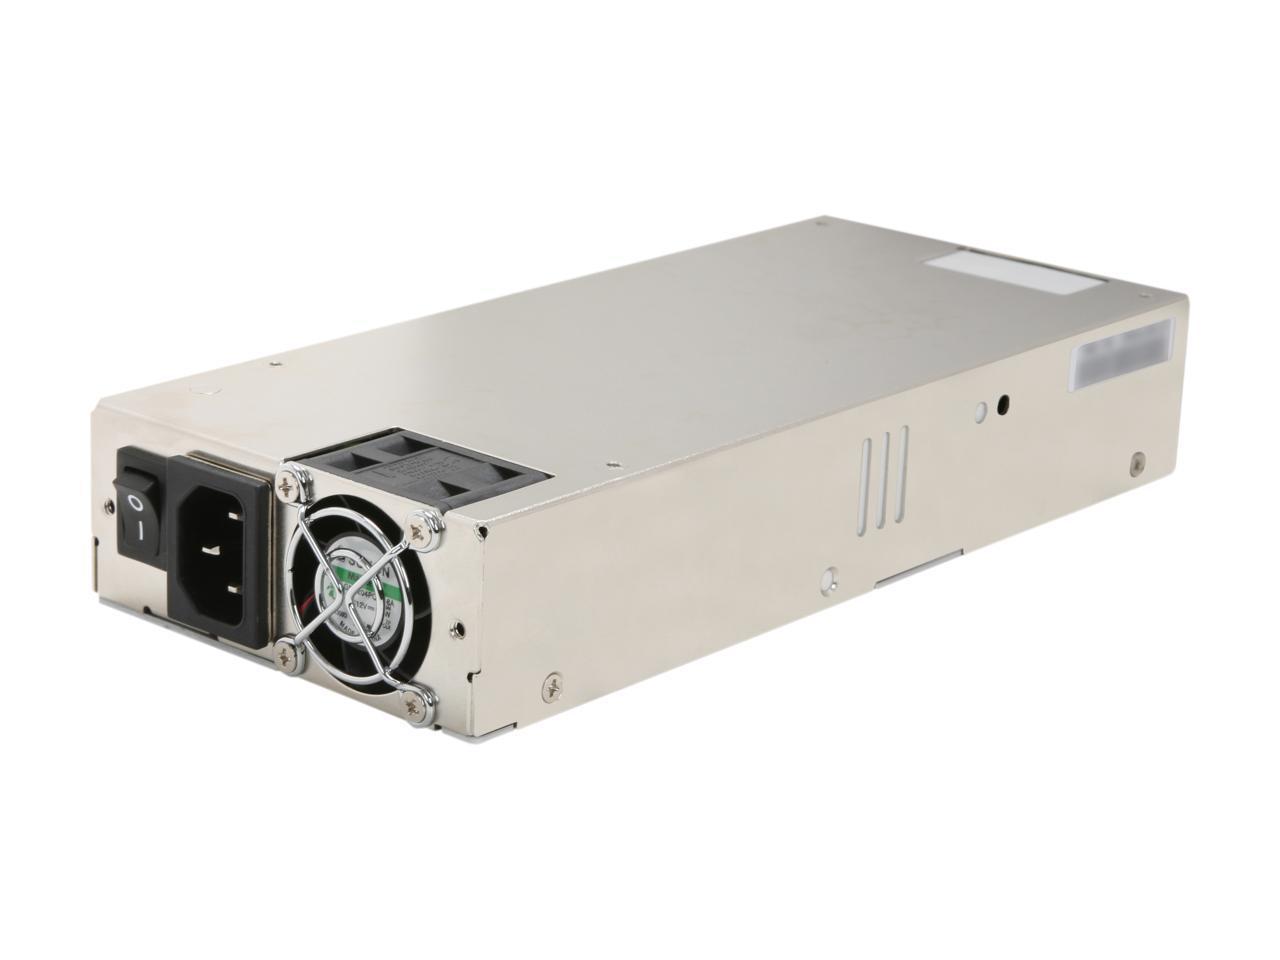 2U Single Power Supply Zippy 500w P2H-5500V